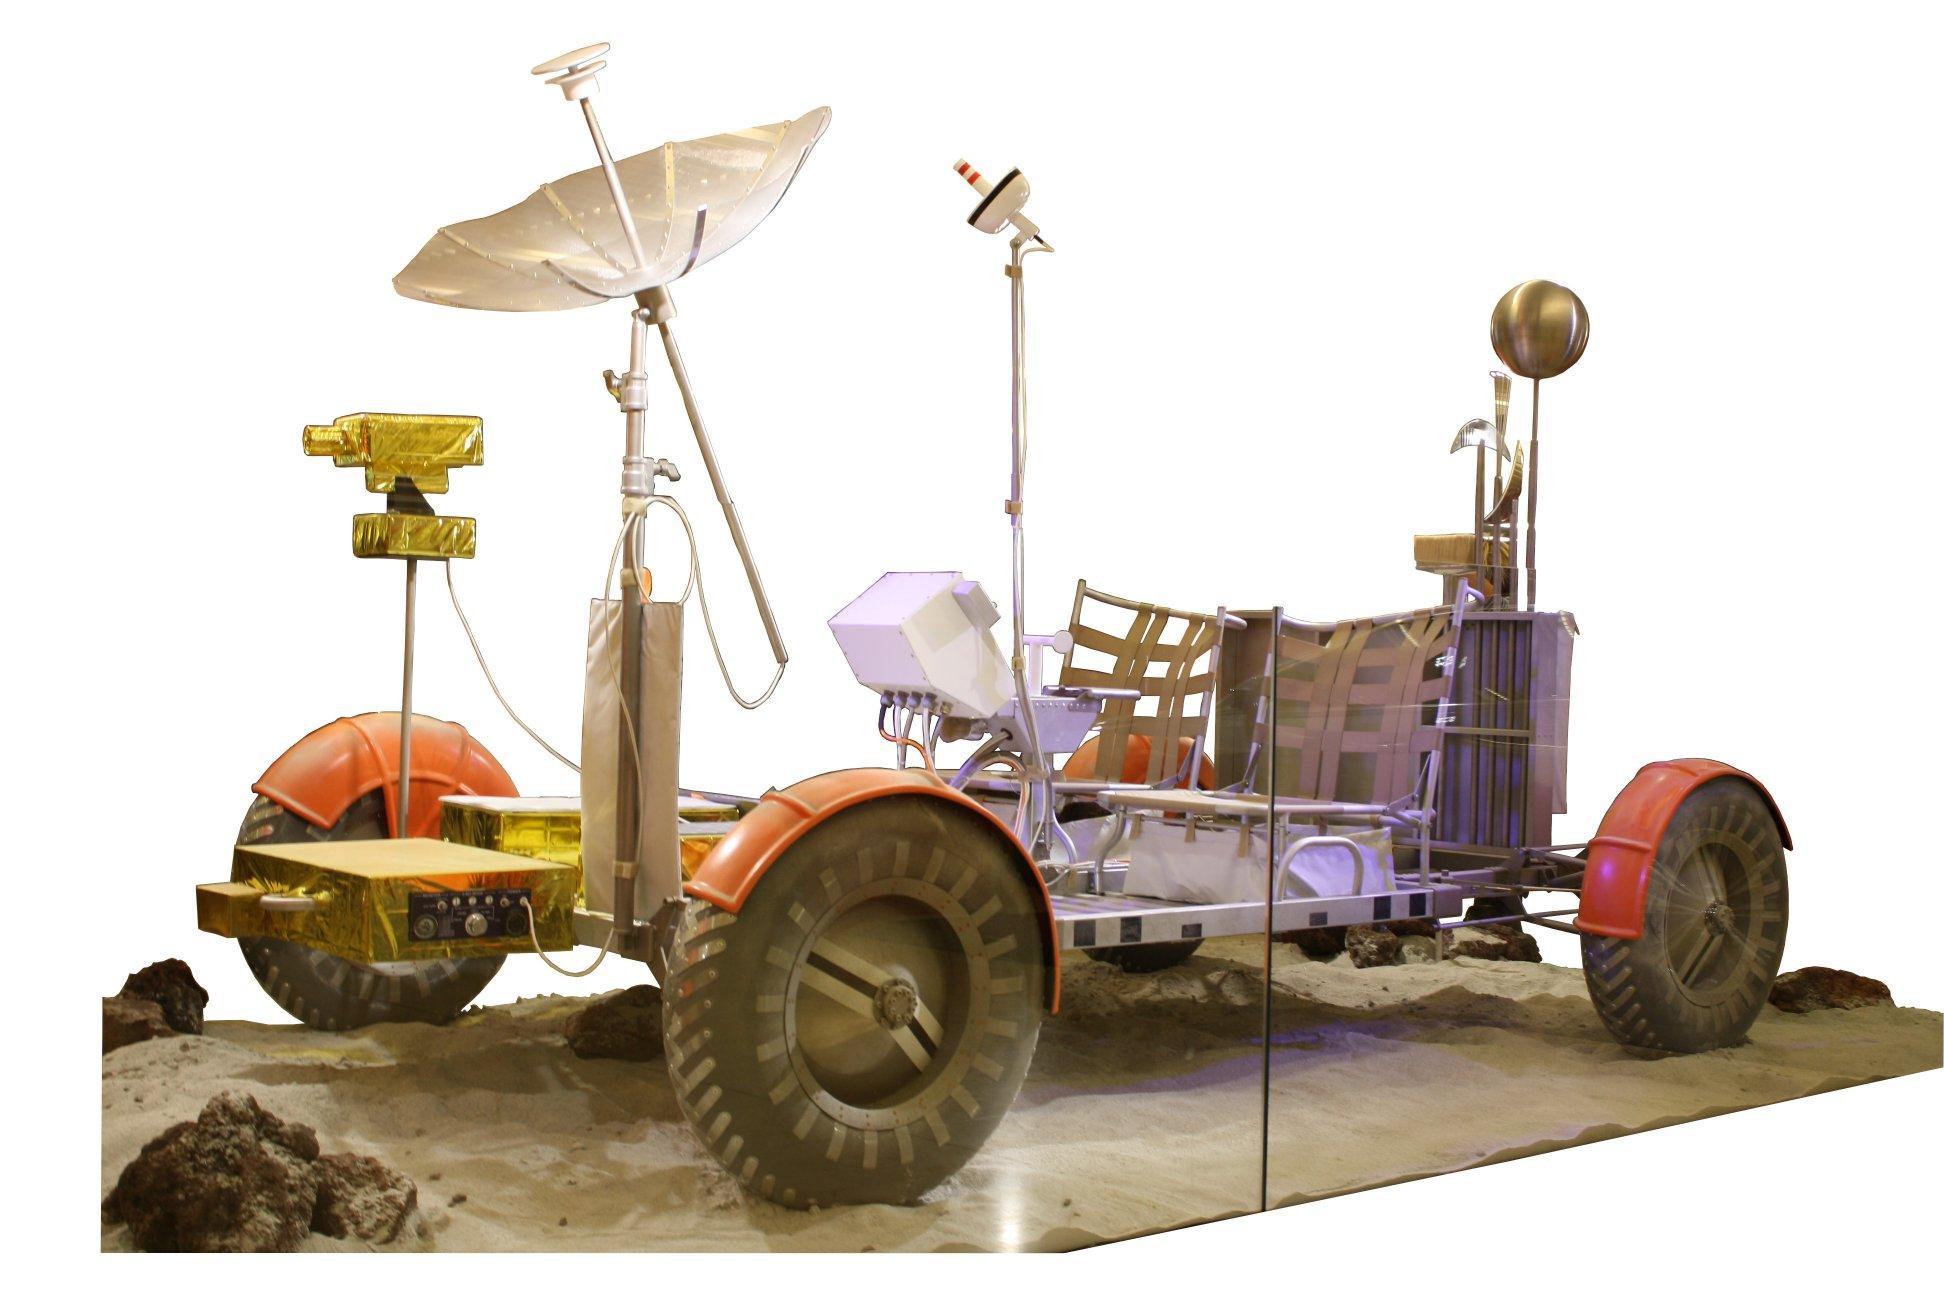 01_Rover-k.jpg